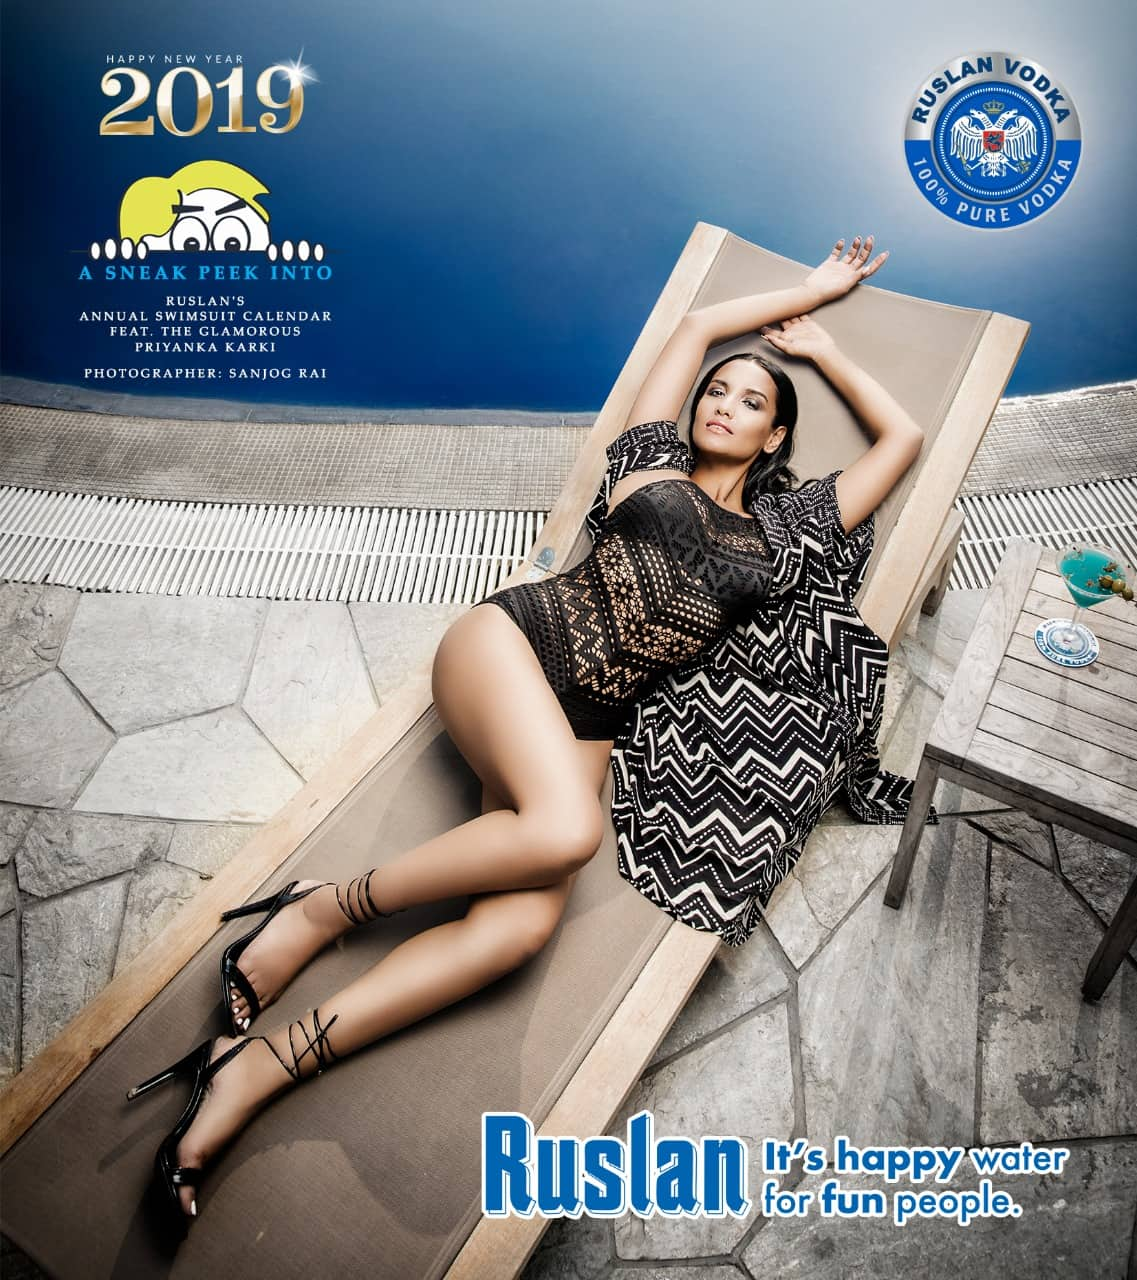 Communication on this topic: Stephanie Zimbalist, priyanka-karki/